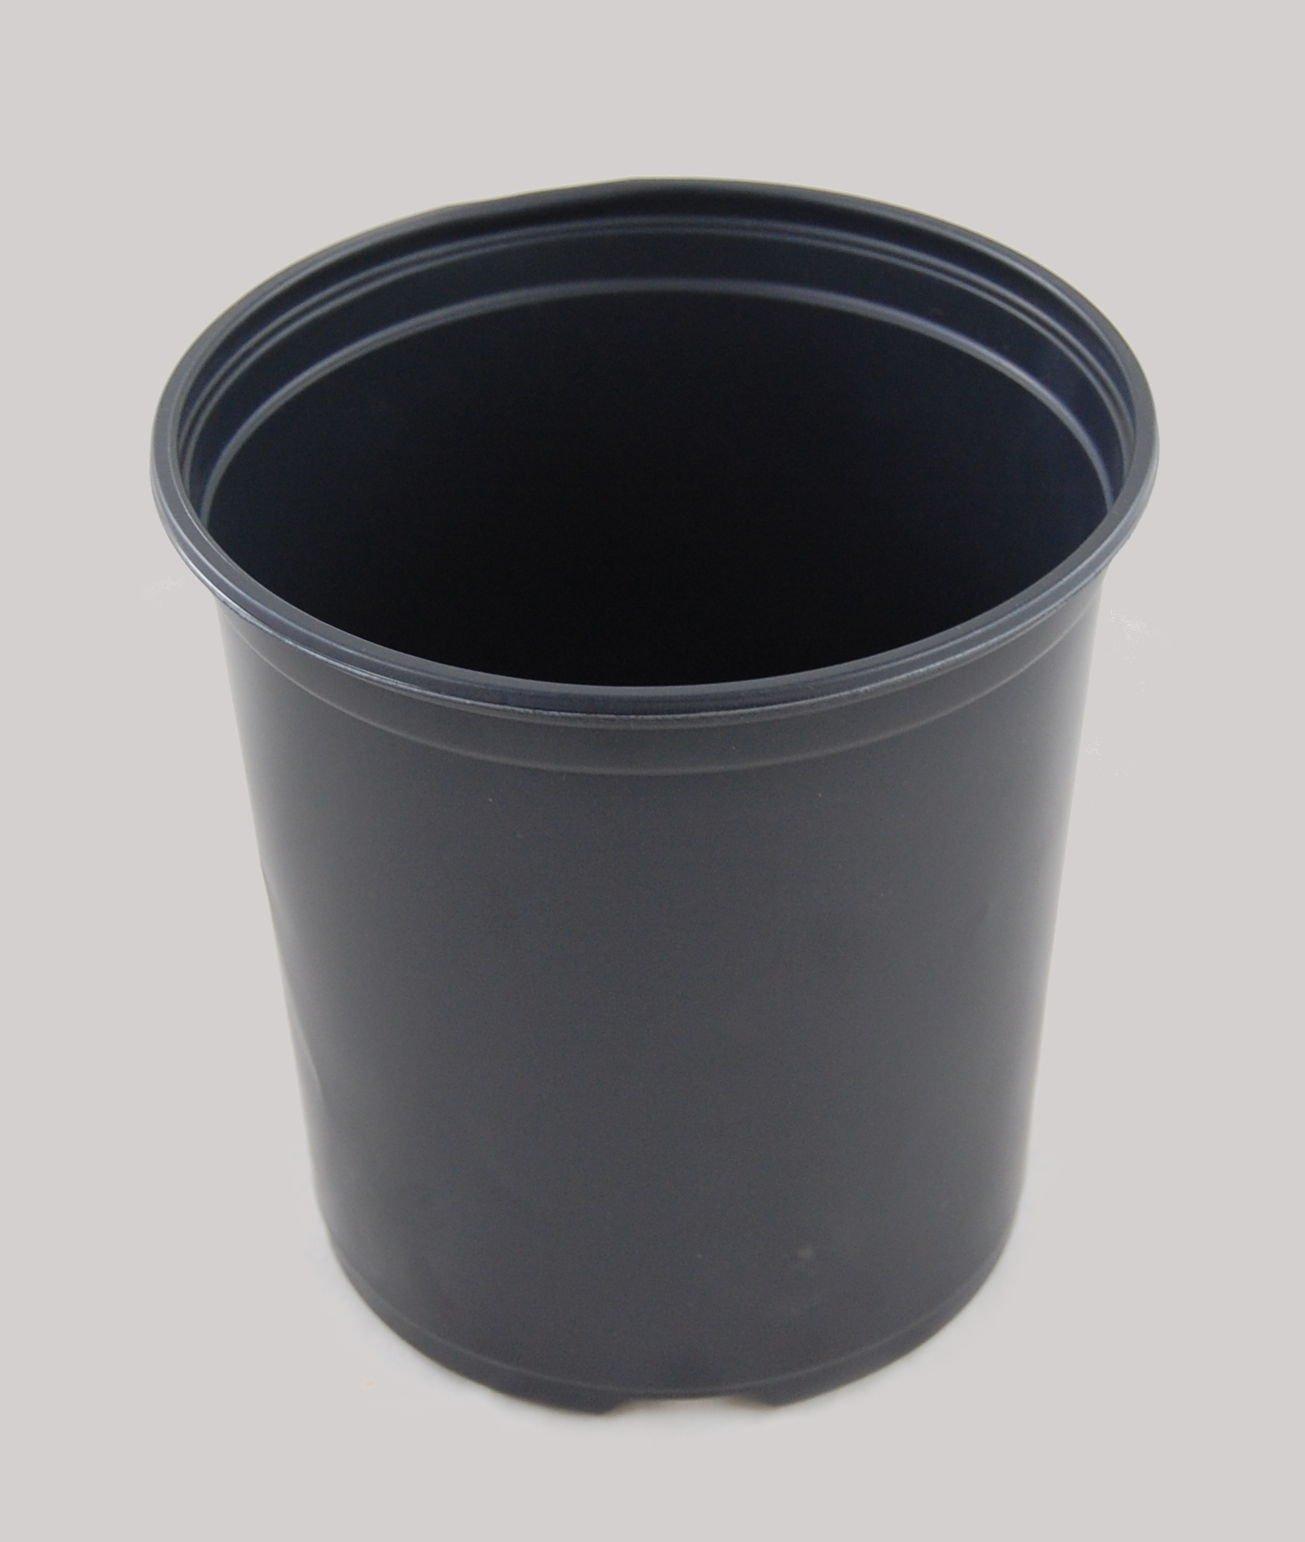 Flower Pots in Bulk 1 Gallon Plastic Nursery Garden Plant Flower Pots, Small Flower Pots, Flower Pots indoor Decorative (150) by Flower Pots (Image #3)